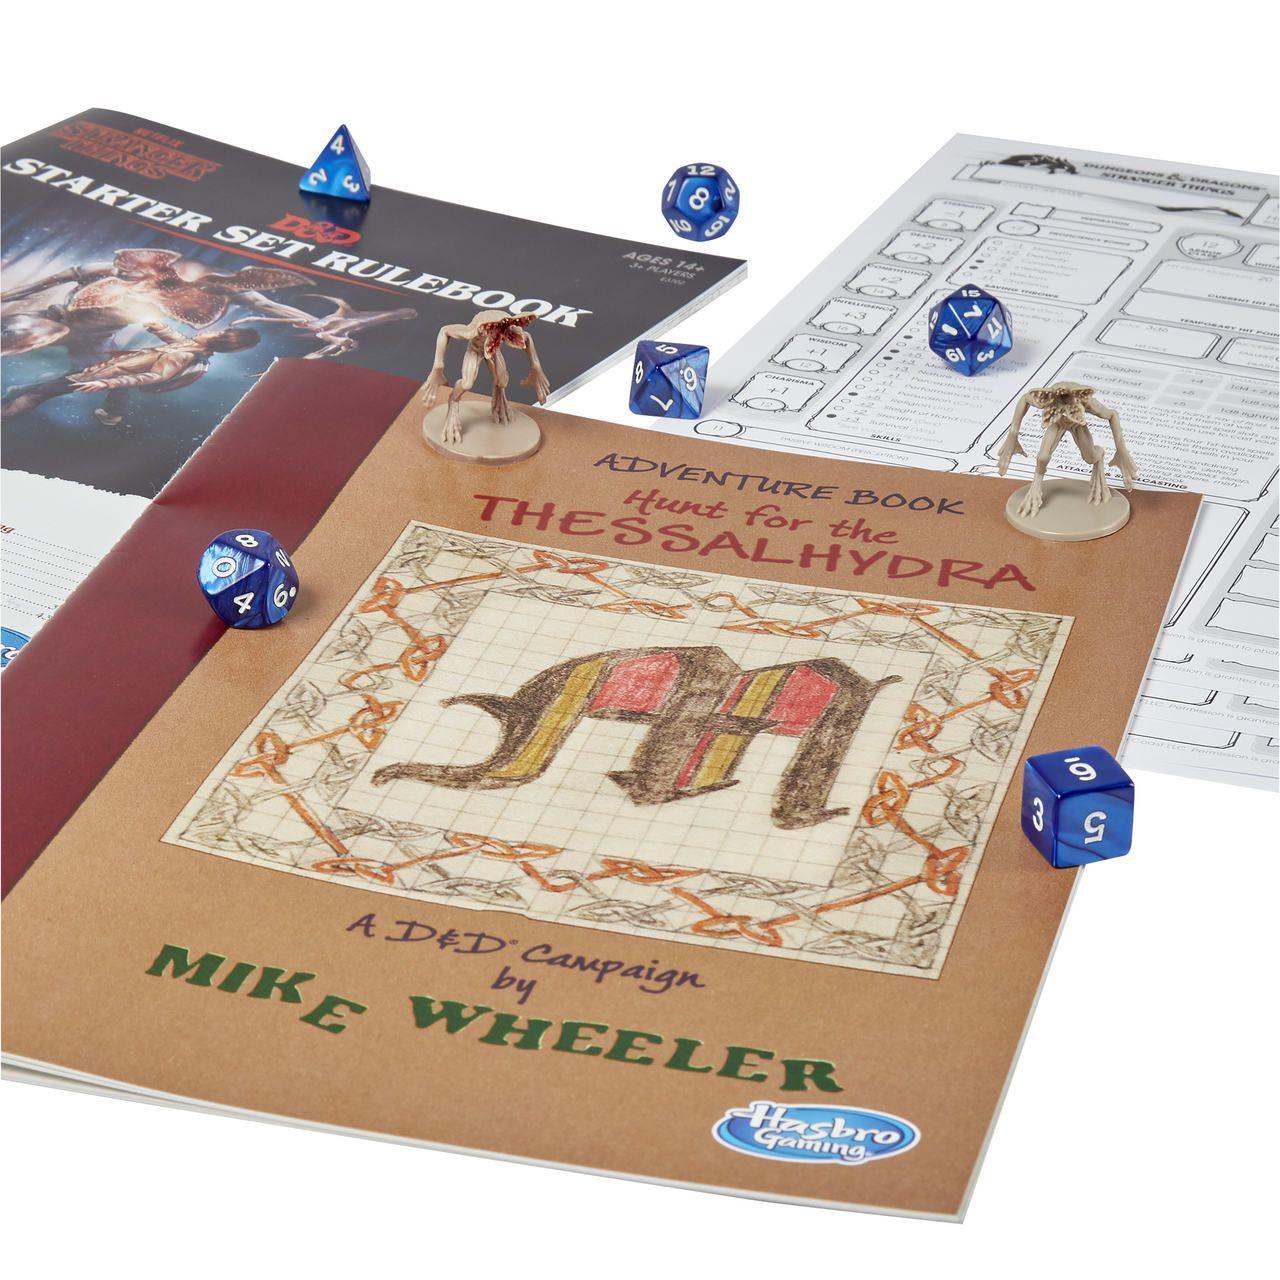 Jogo de Tabuleiro (Board Games) Dungeons & Dragons (Starter Set): Stranger Things